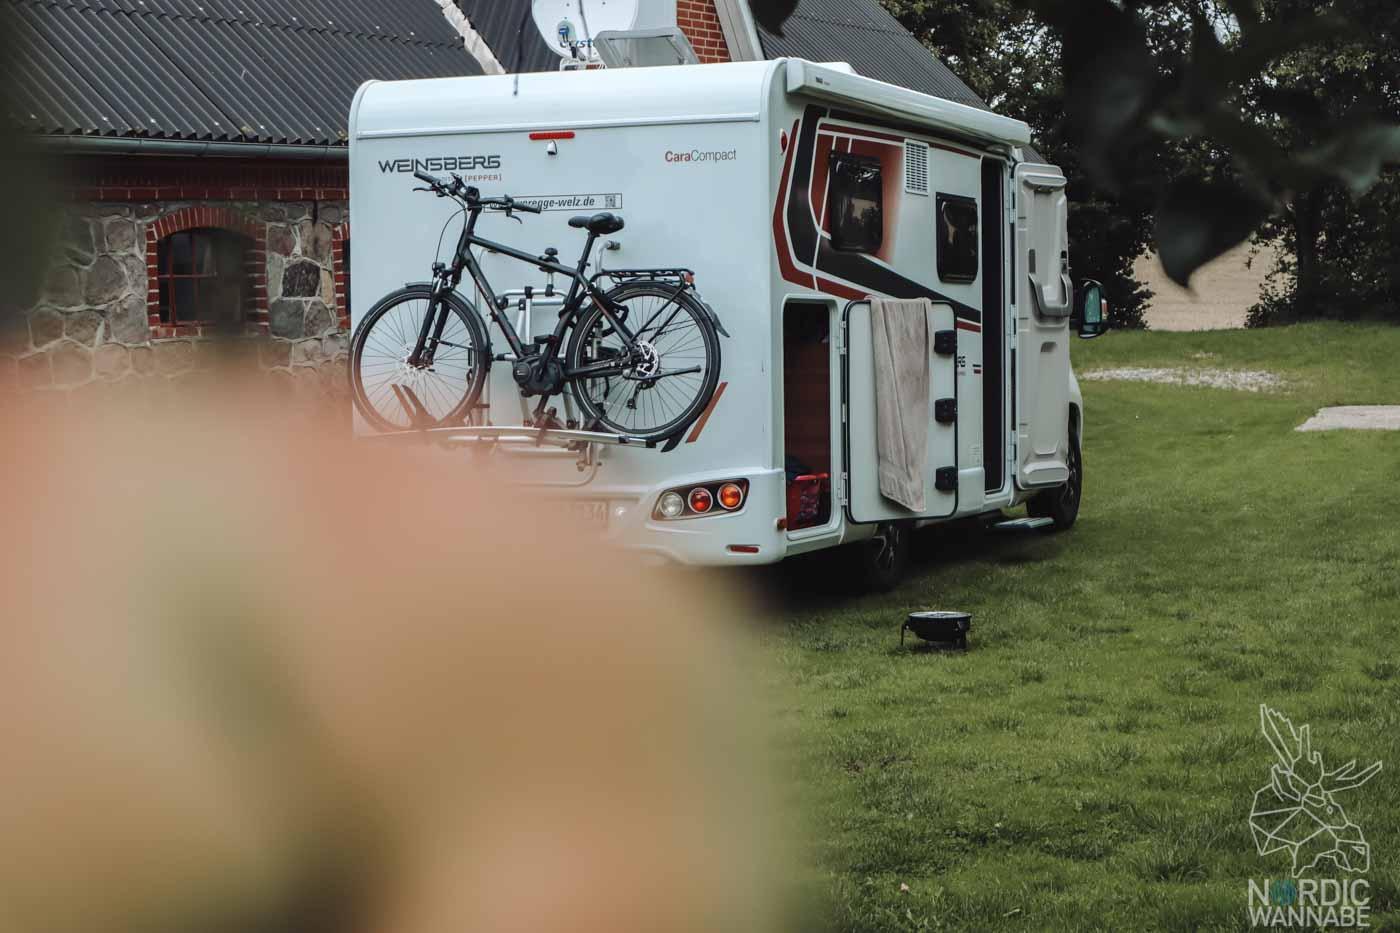 Wohnmobil mieten Osnabrück, Veregge und Welz, Camping in Dänemark, Camping Dänemark Nordsee, Campingplatz Dänemark, Wohnmobilstellplätze in Dänemark,Camping Dänemark Ostsee, Camping Dänemark Strand